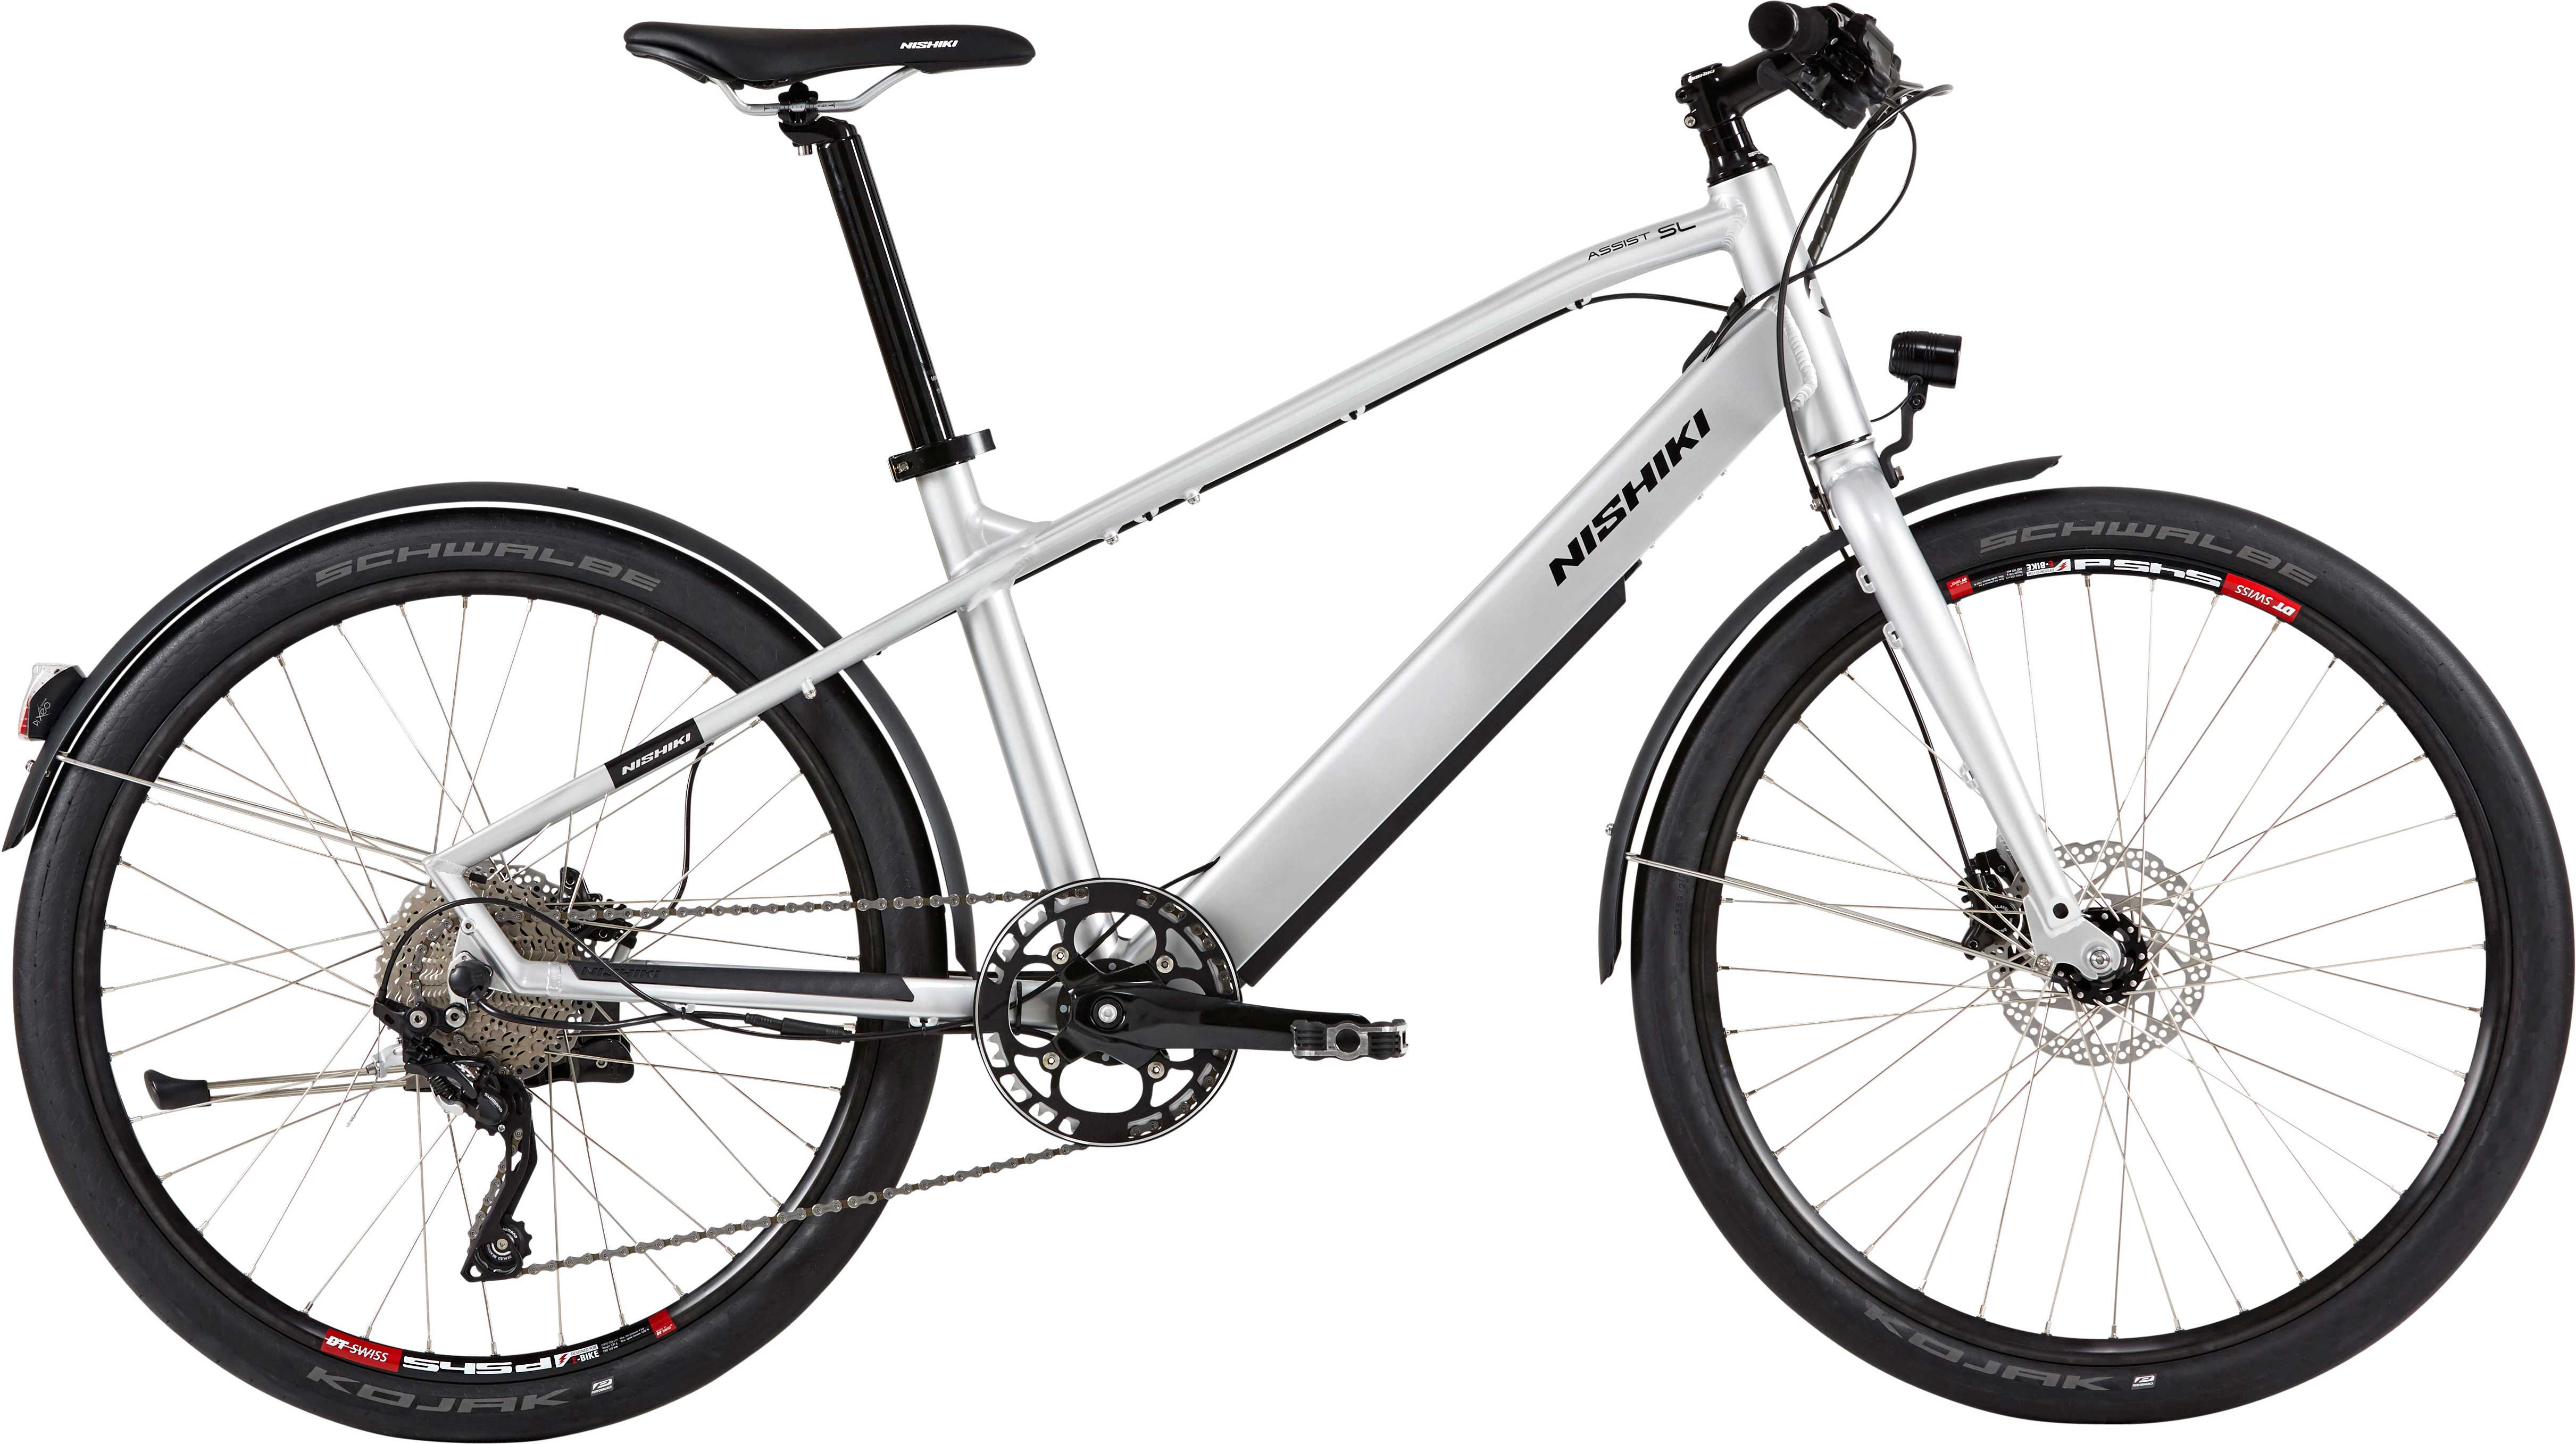 NISHIKI ASSIST SL UNISEX S | City-cykler